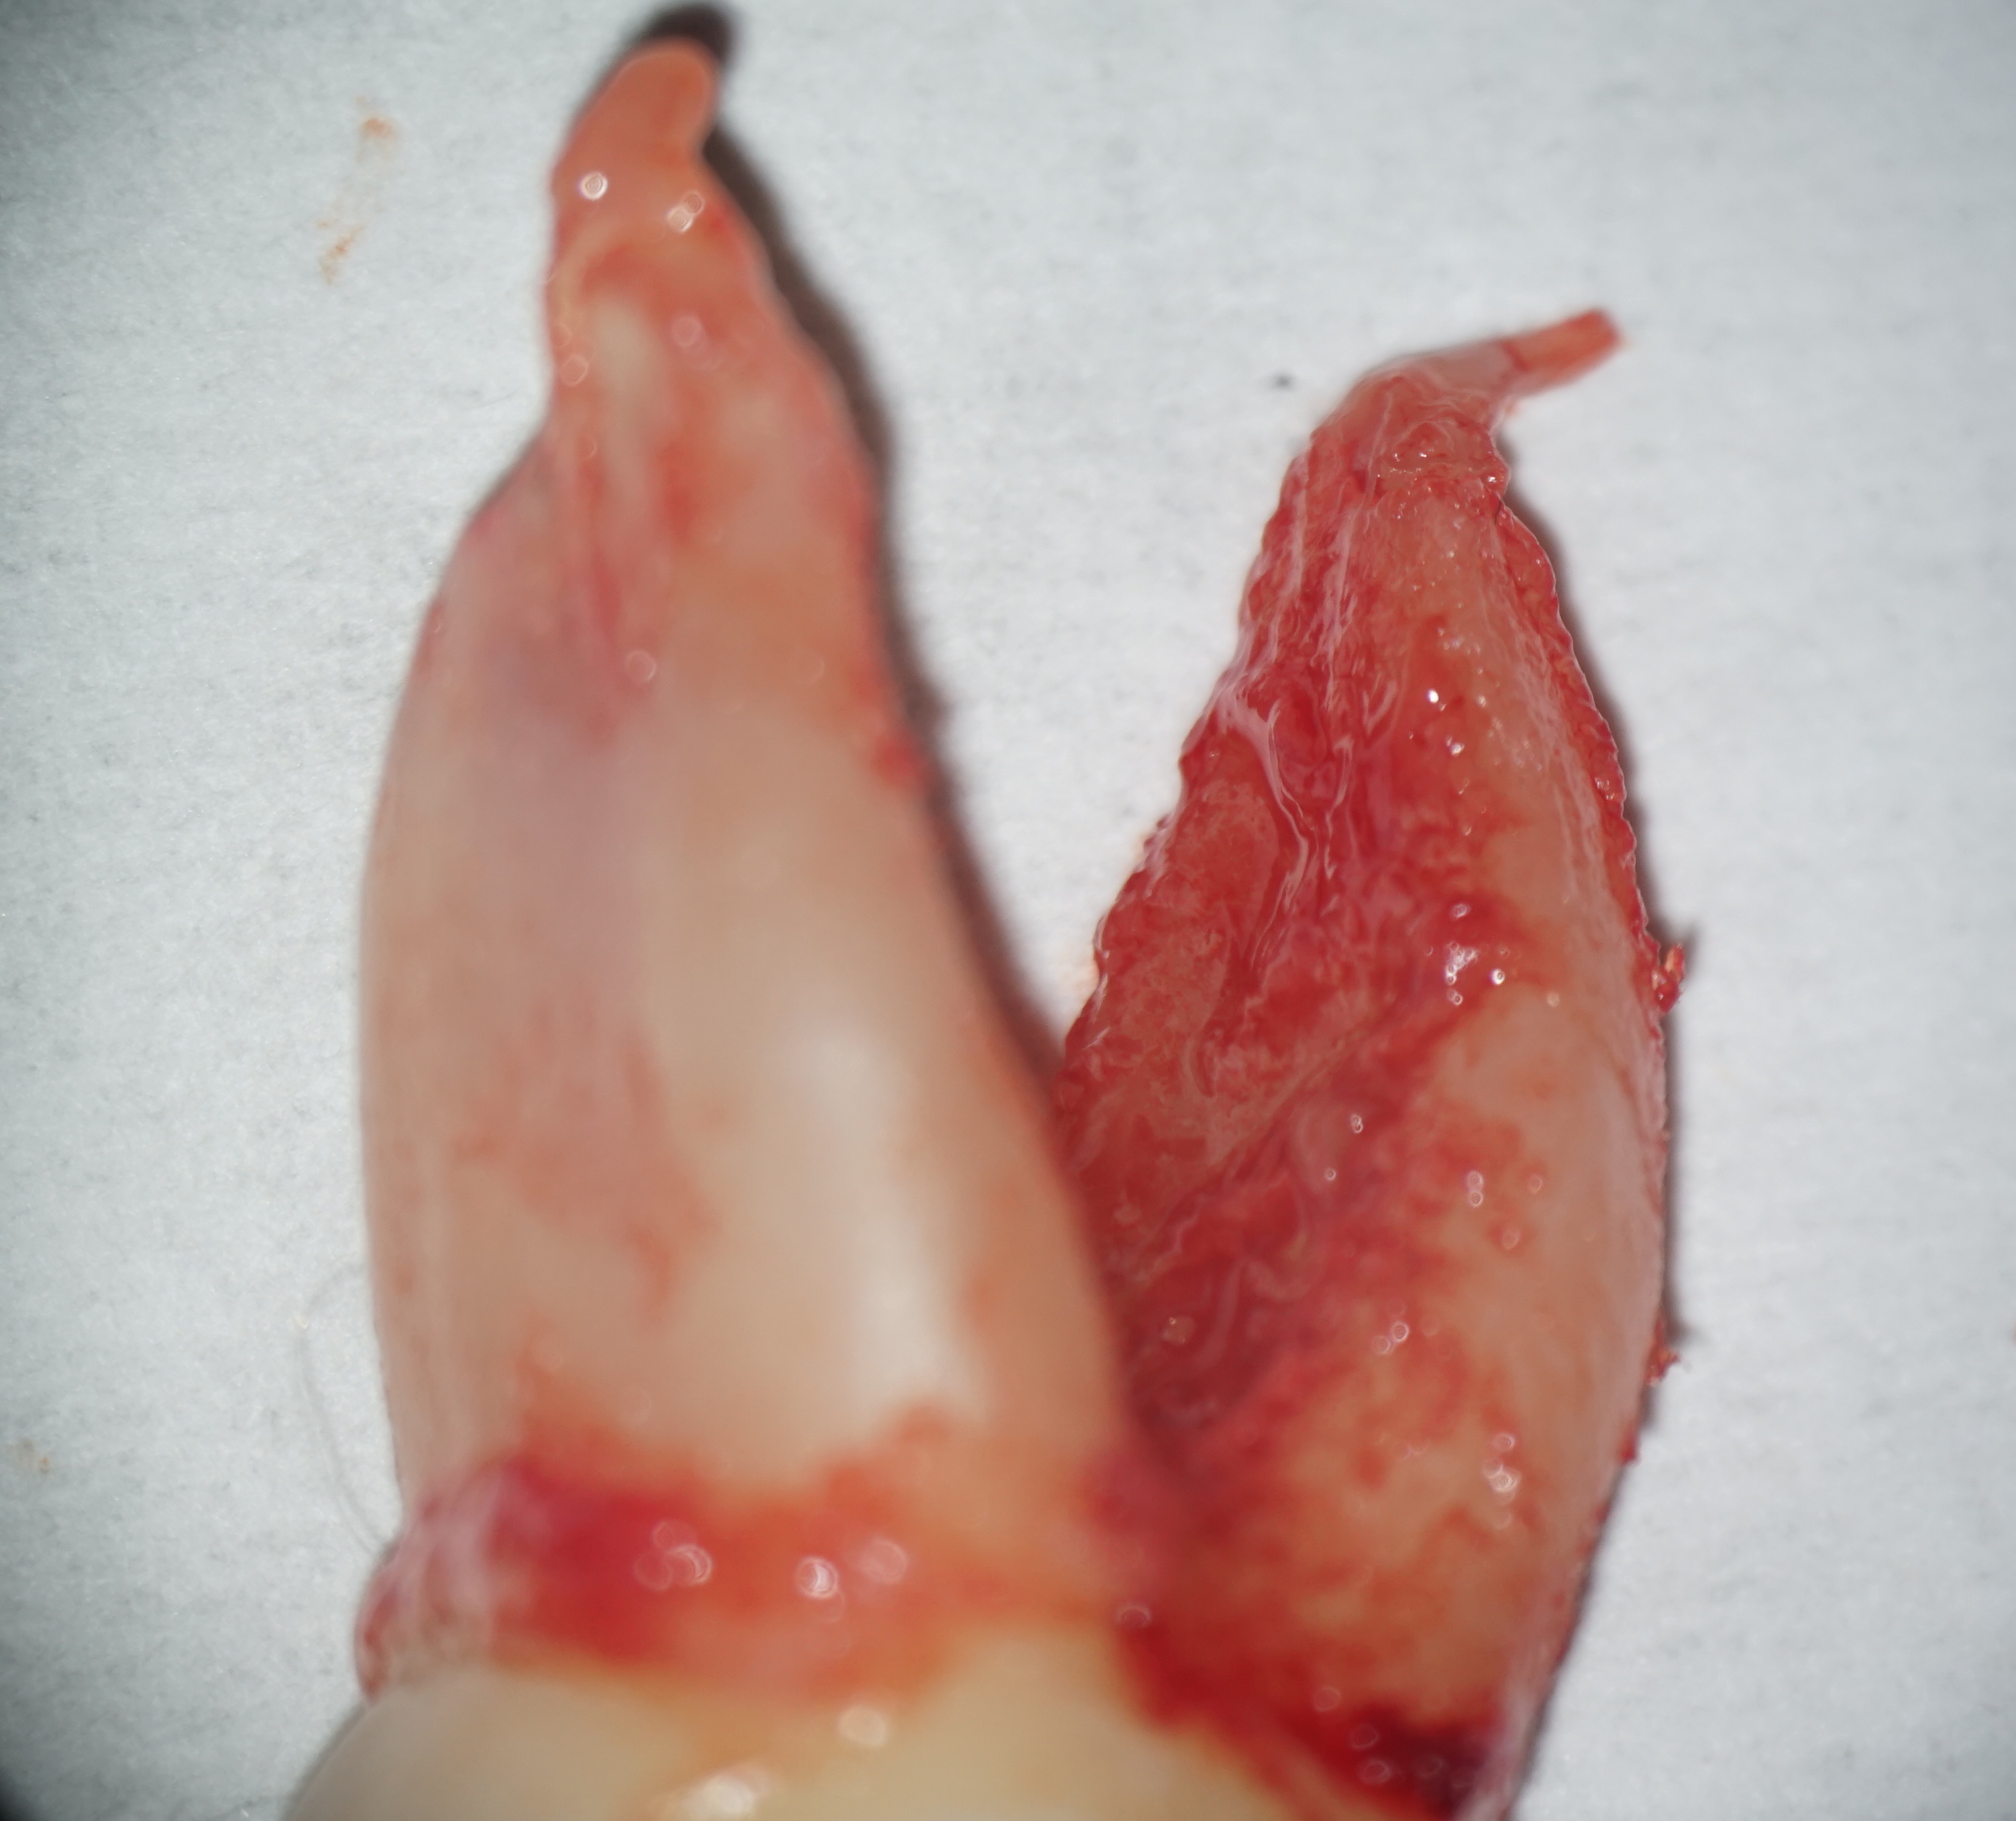 Dental work in progress on tooth